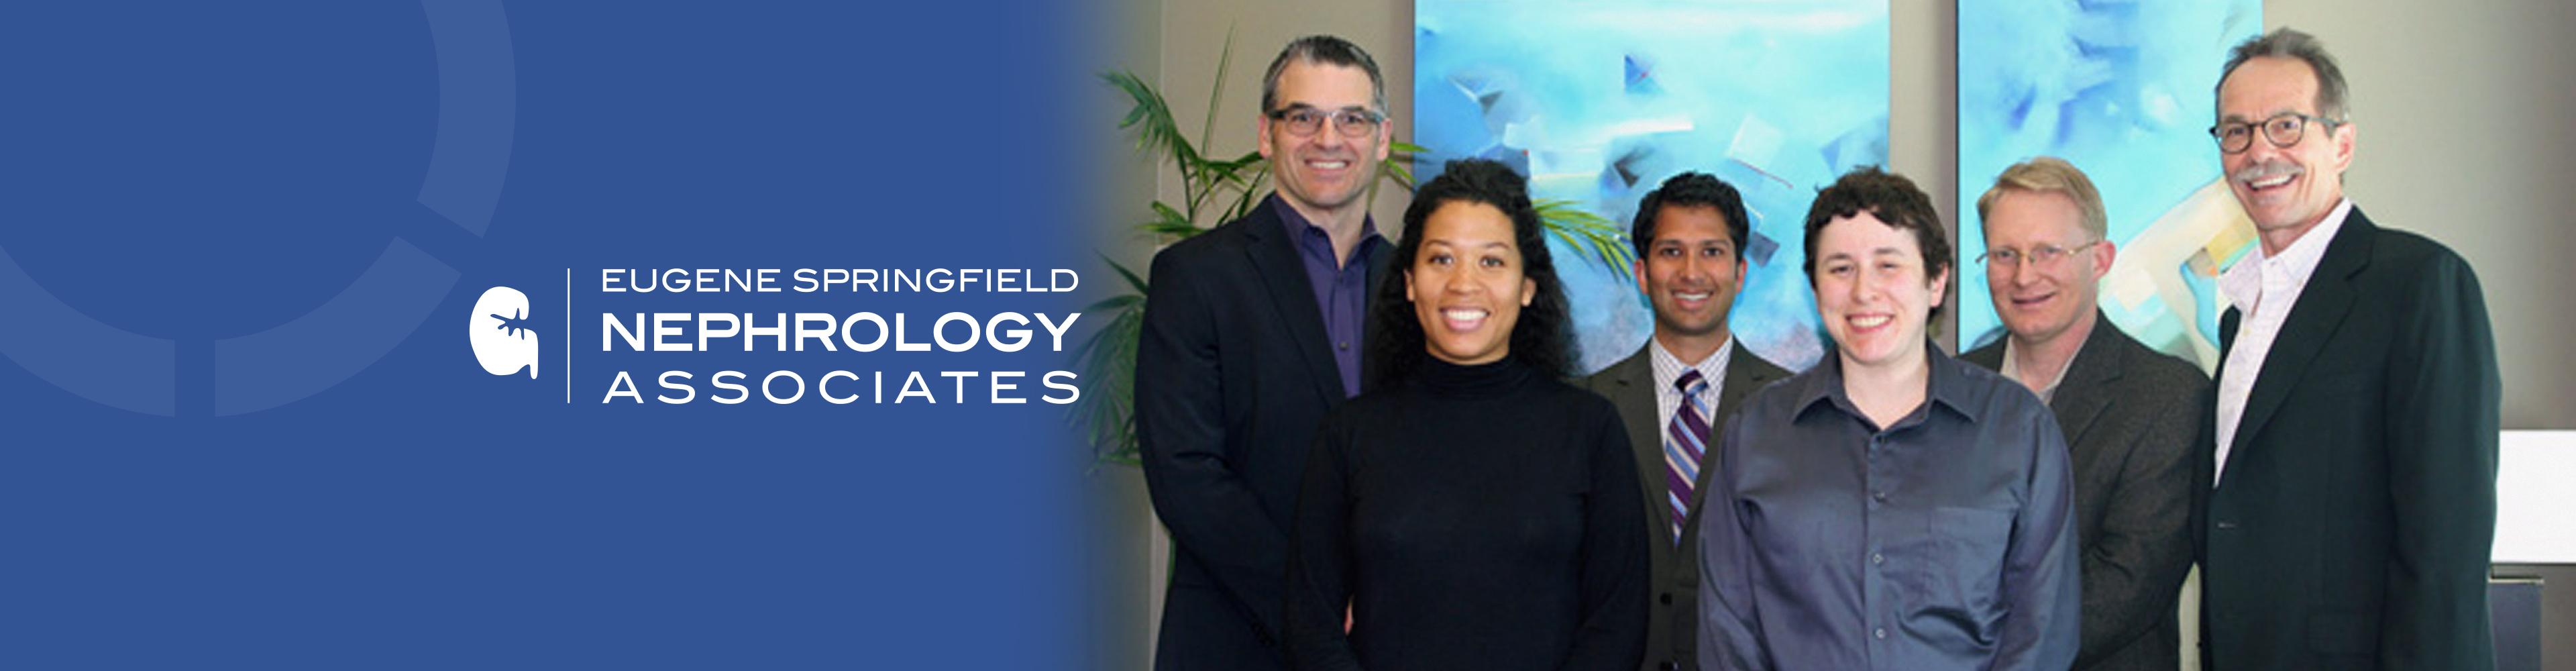 Eugene Springfield Nephrology Associates - Northwest Health